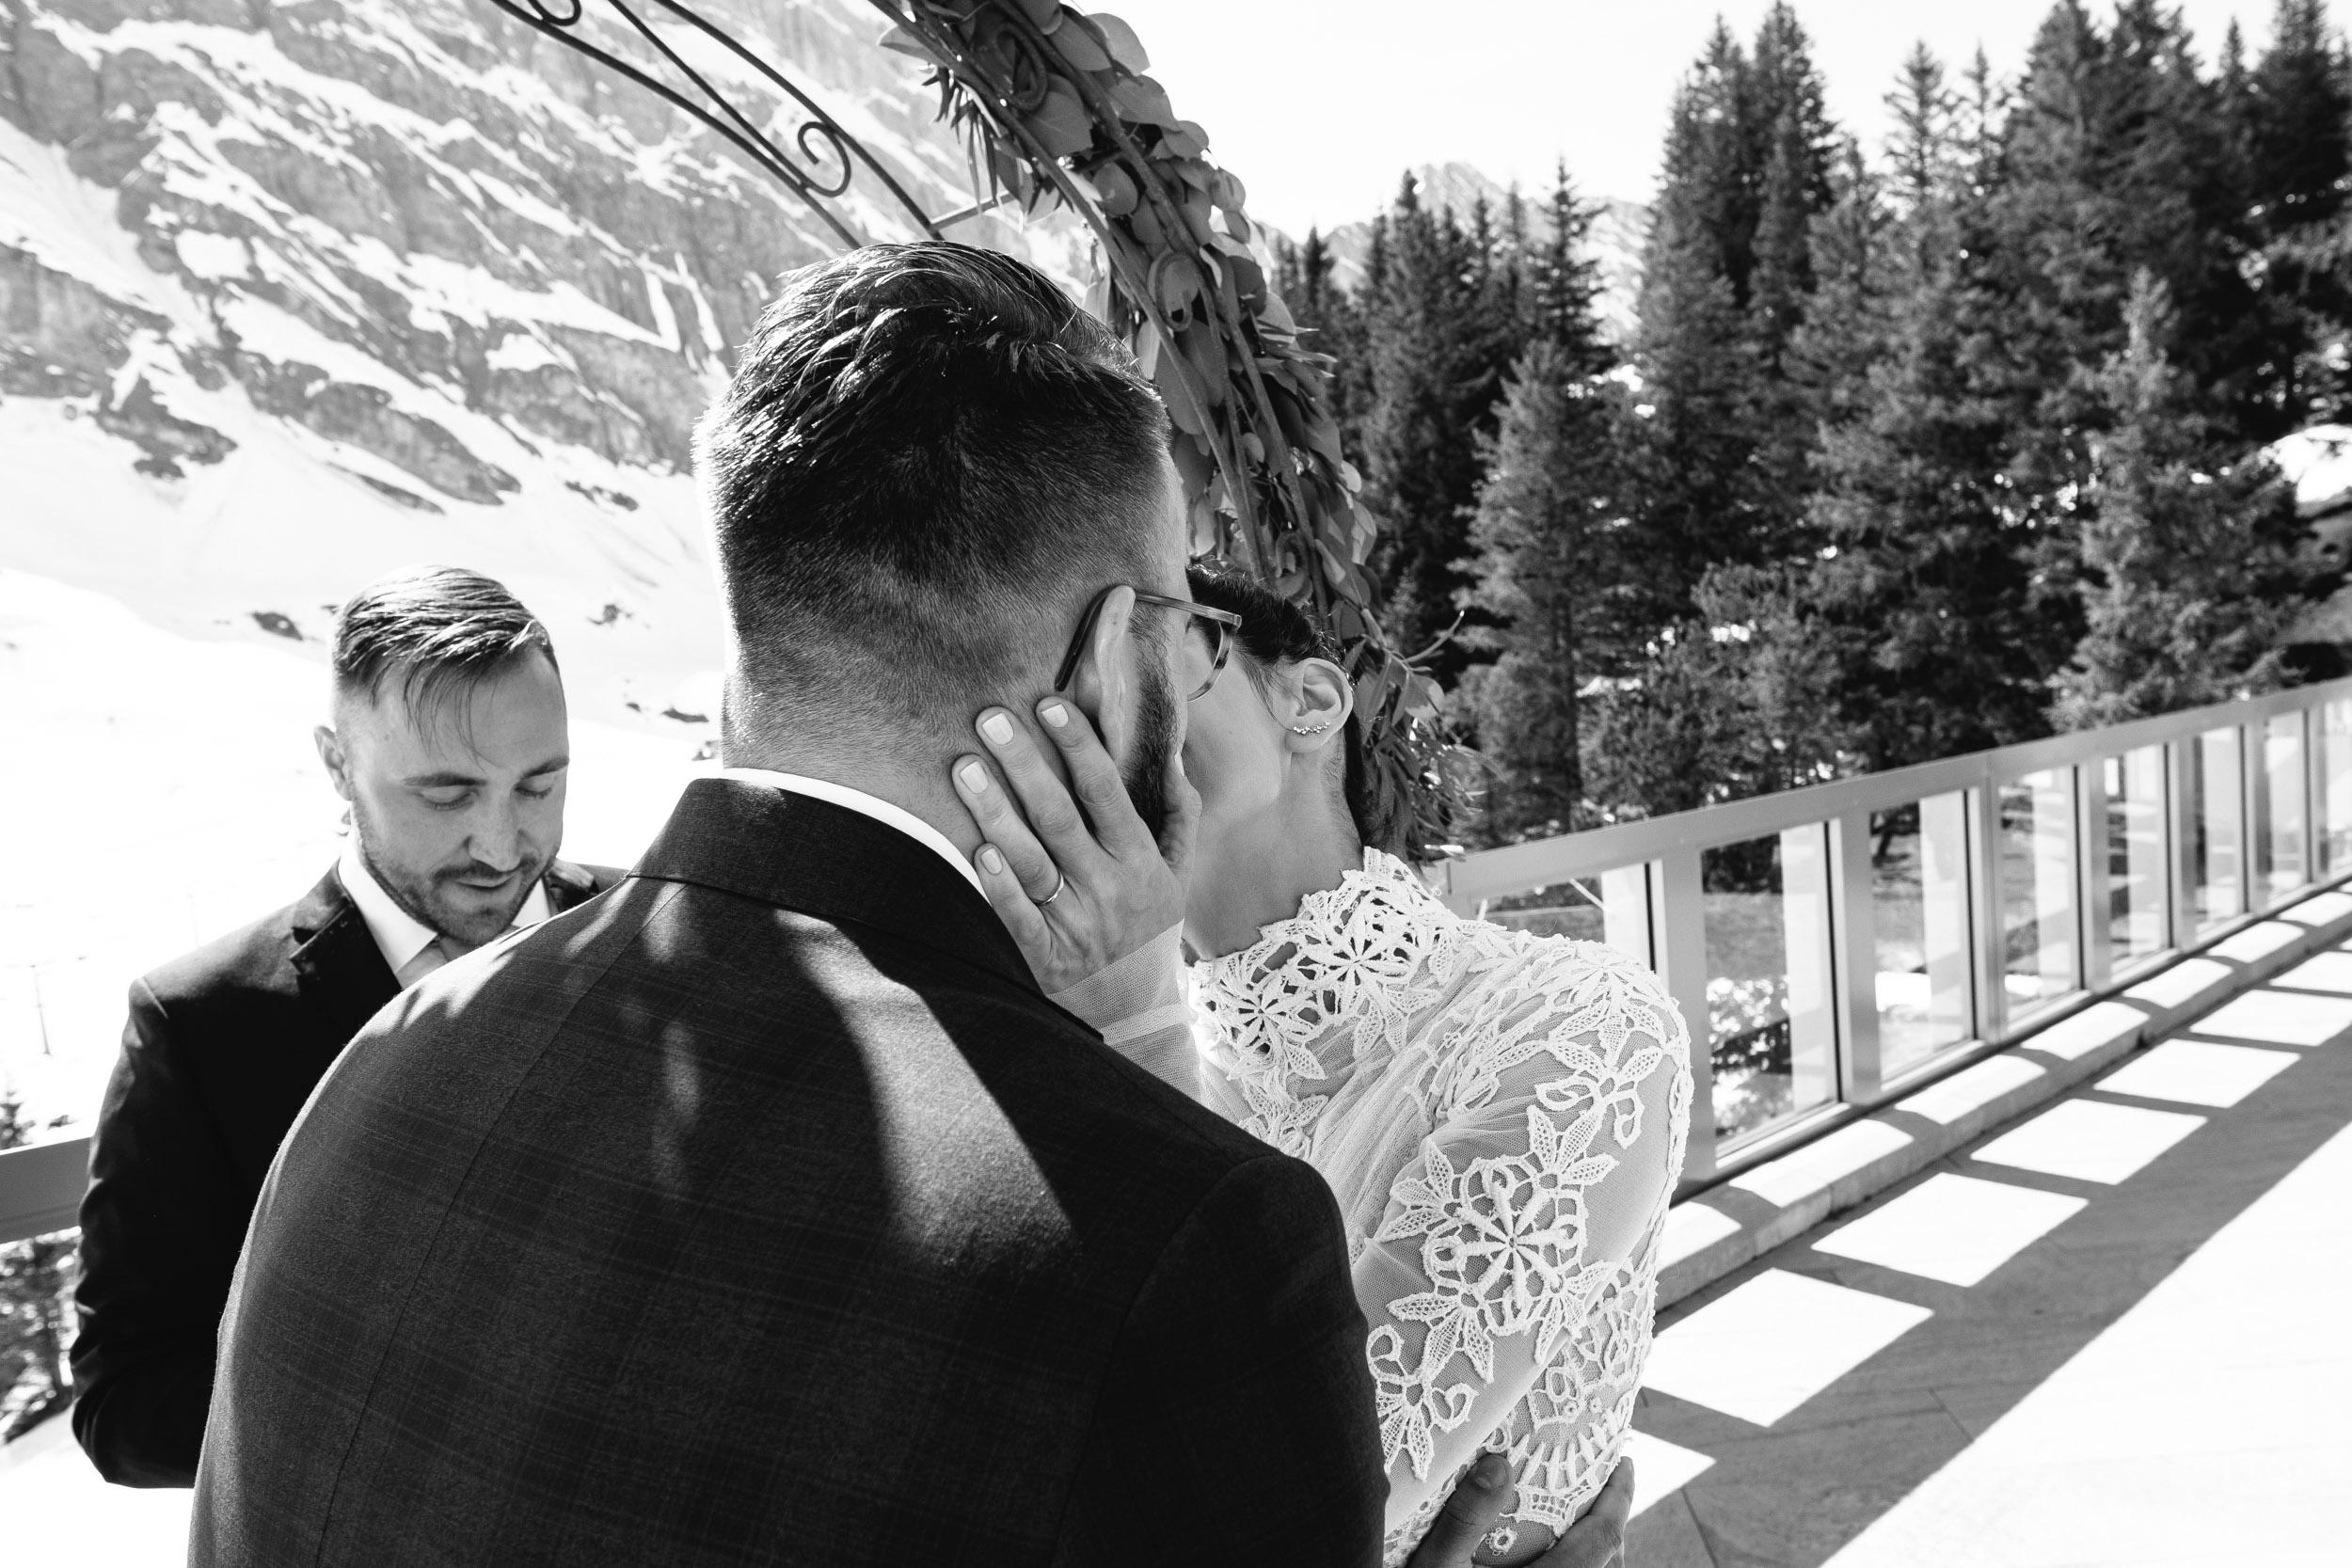 lynn-bastian-switzerland-wedding-photography-64.jpg